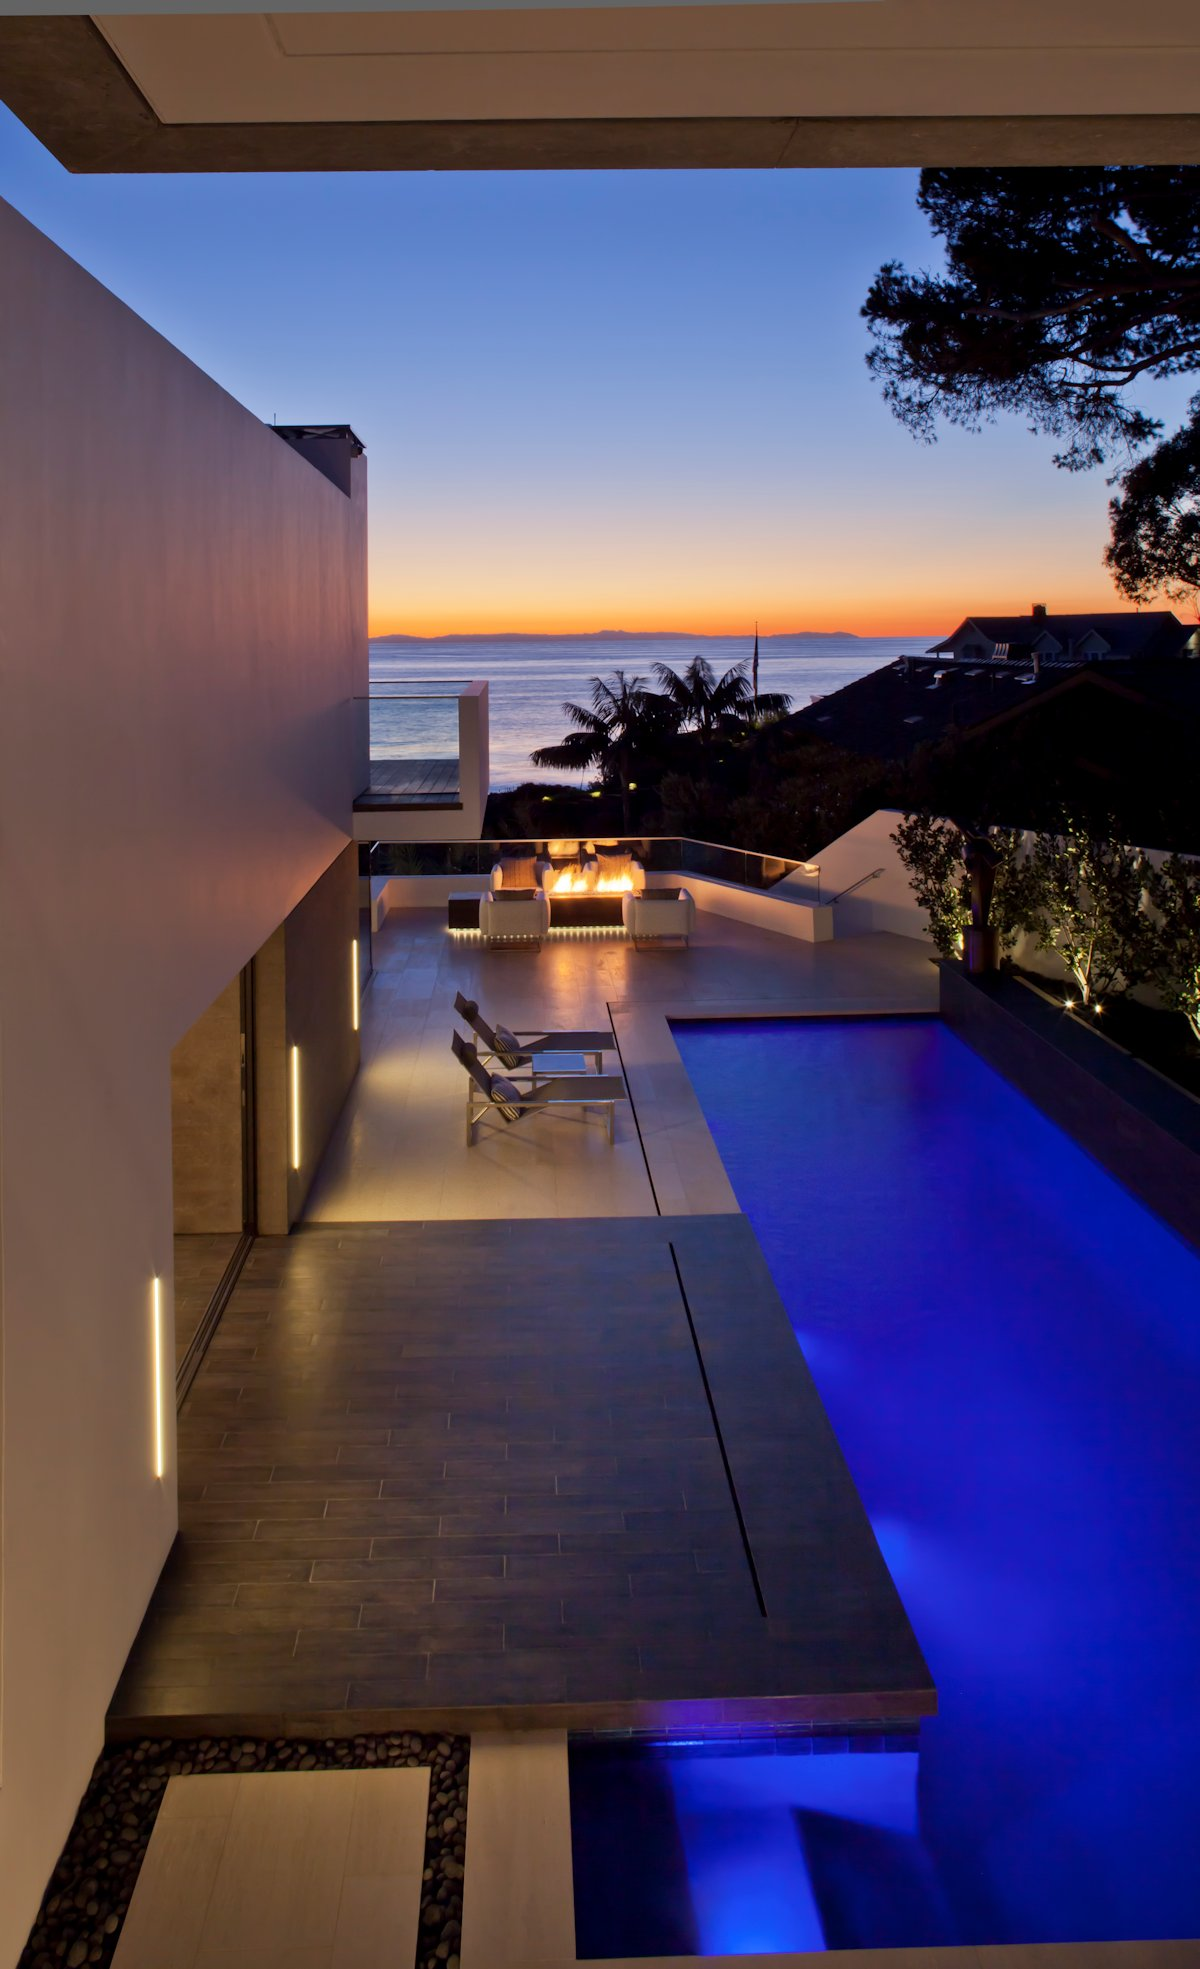 Outdoor Pool, Lighting, Beach House in Laguna Beach, California